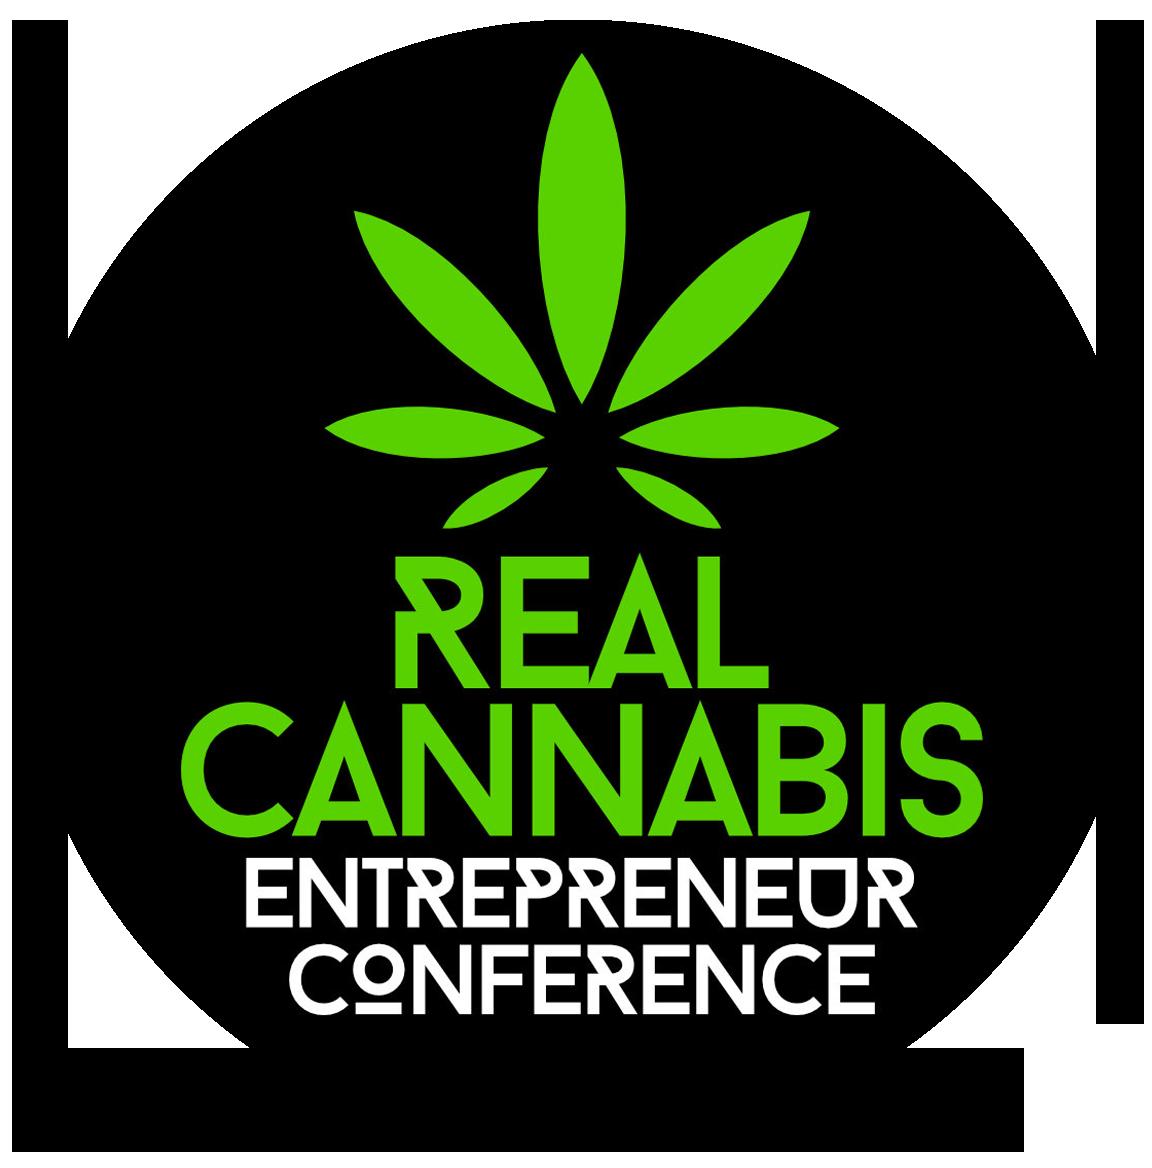 Real Cannabis Entrepreneur